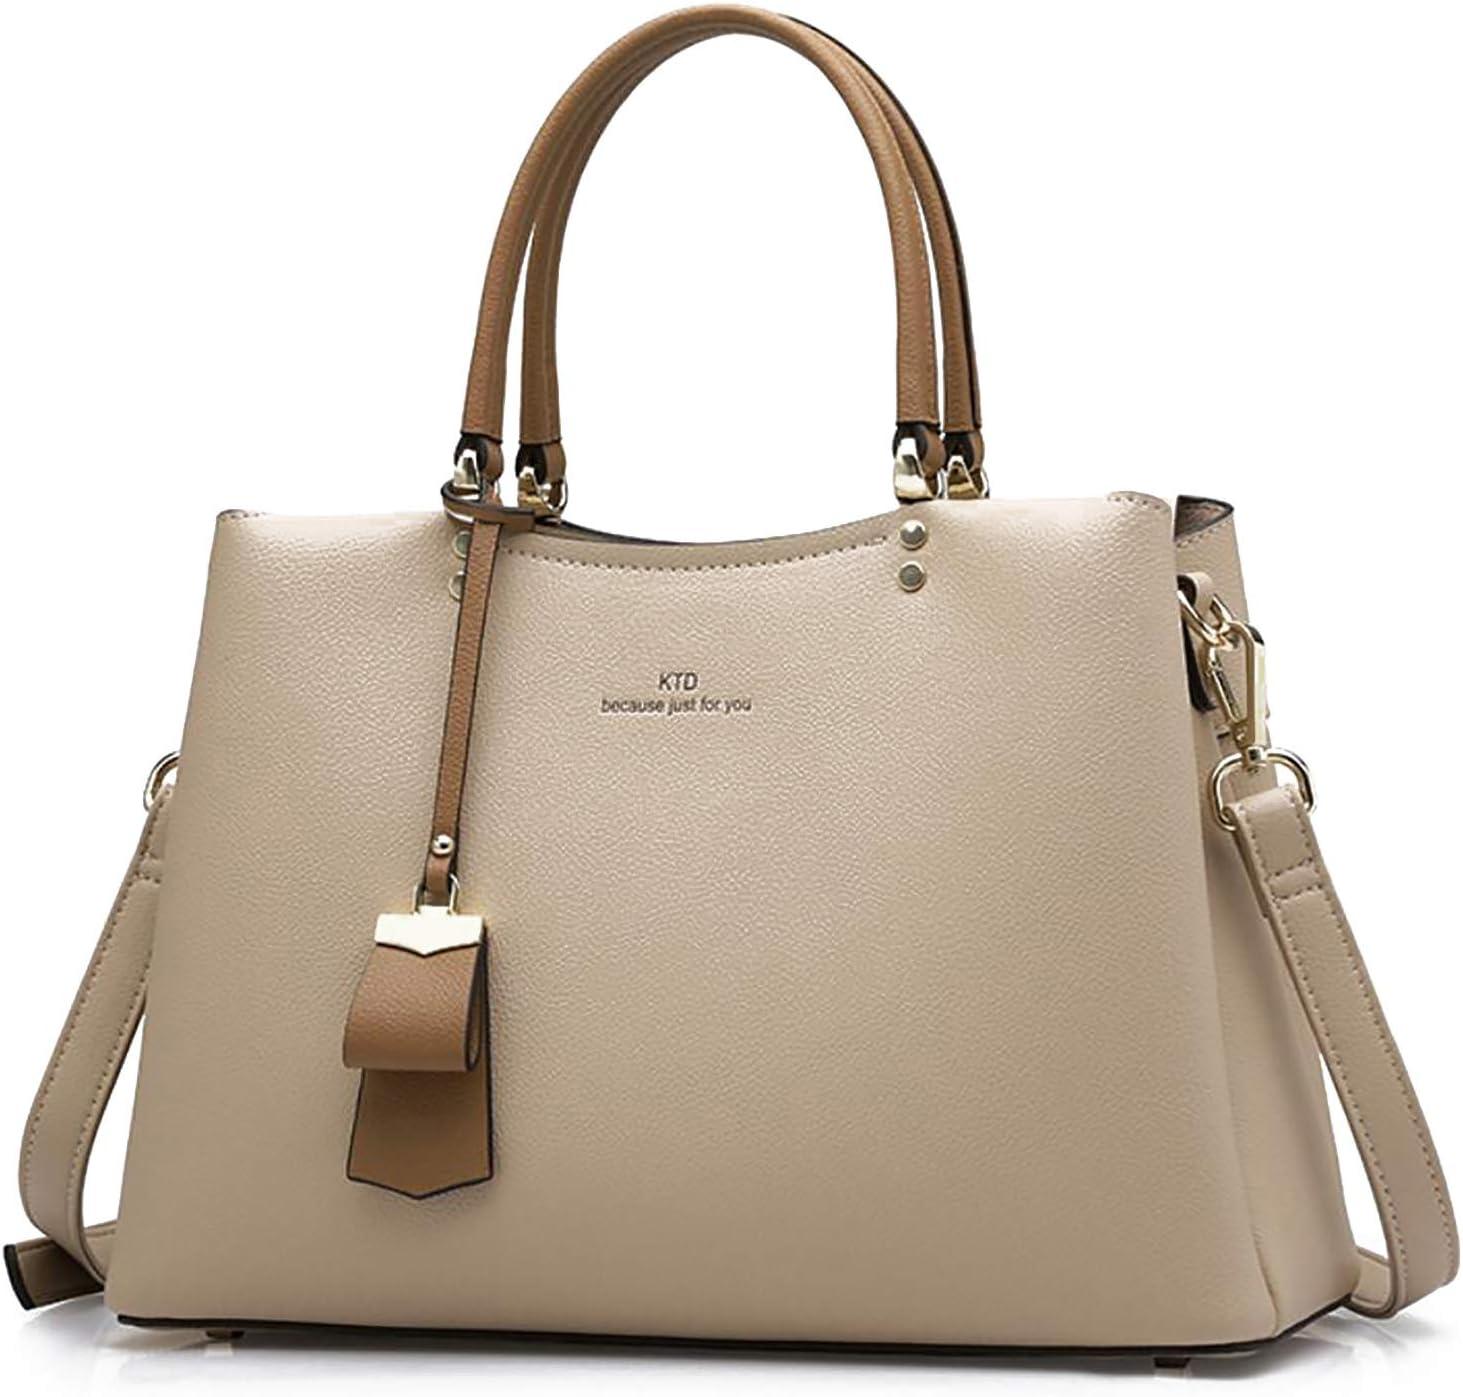 Ladies Leather Brand Very popular! new Handbags Shoulder Top